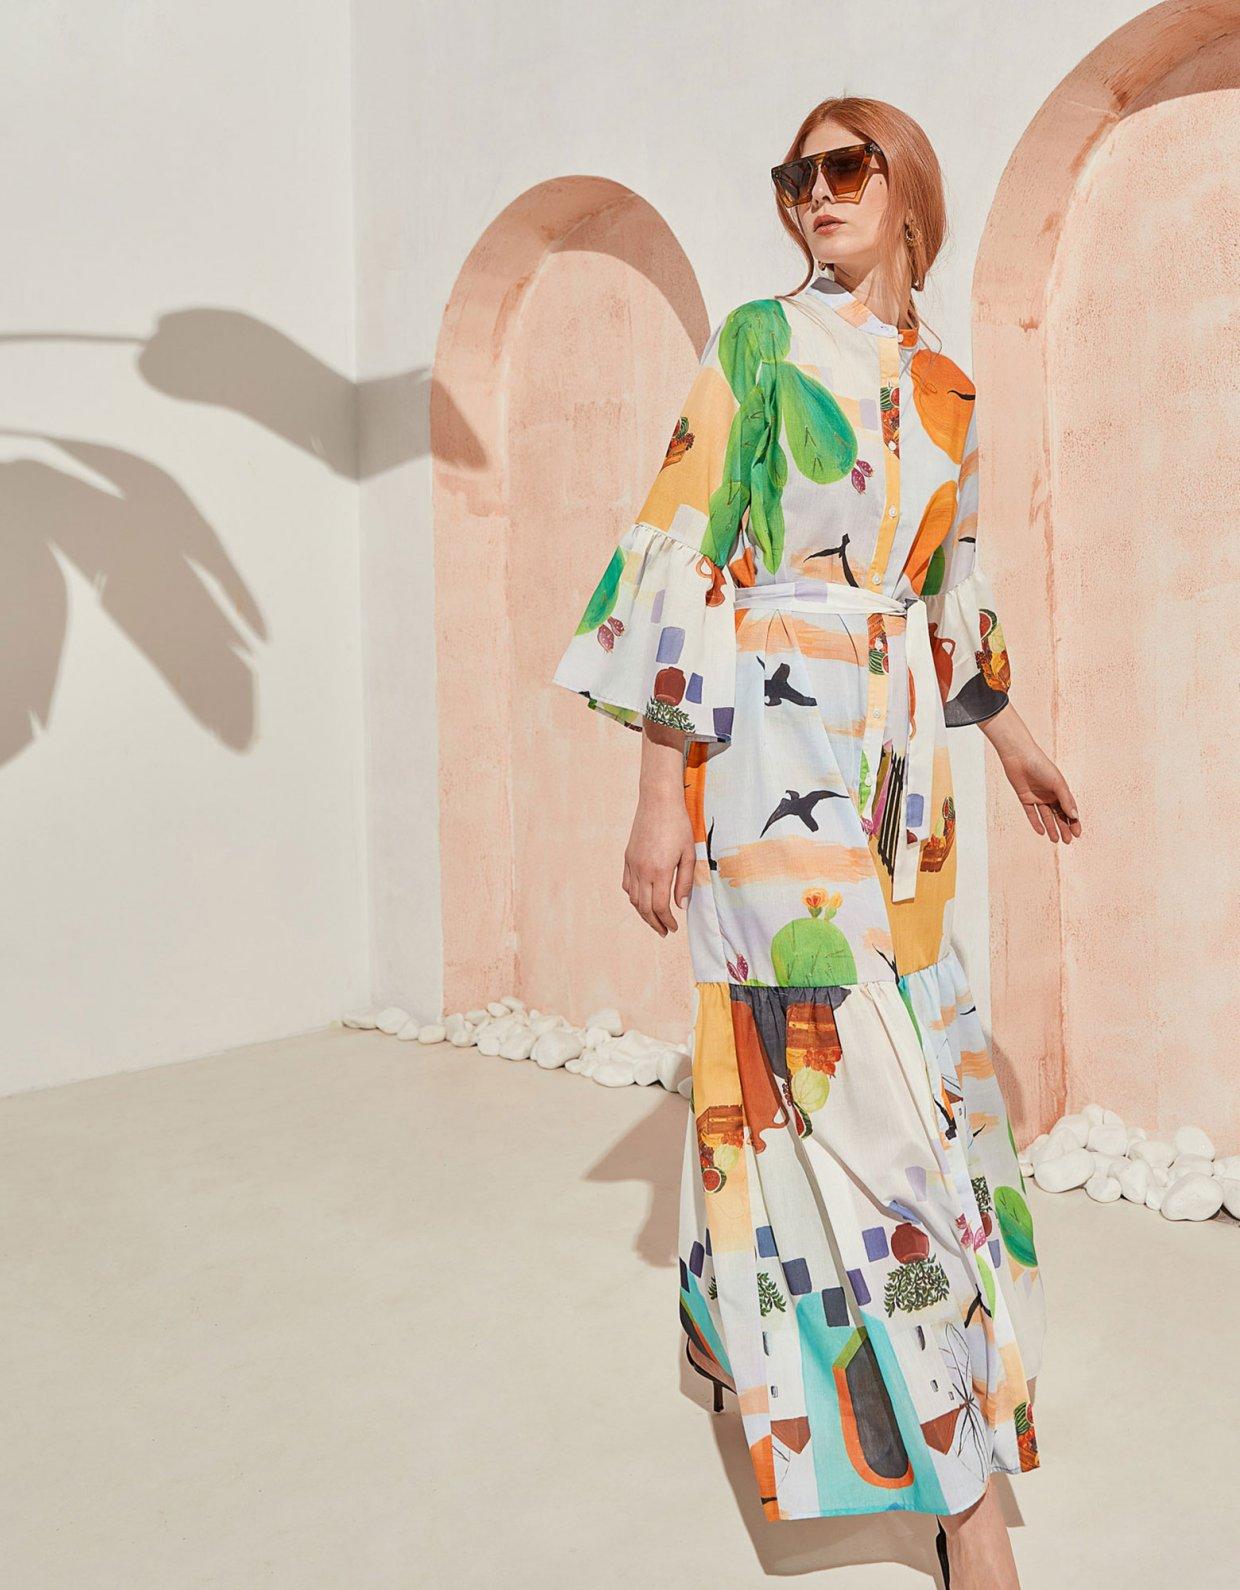 The Knl's Sway maxi dress cactus print